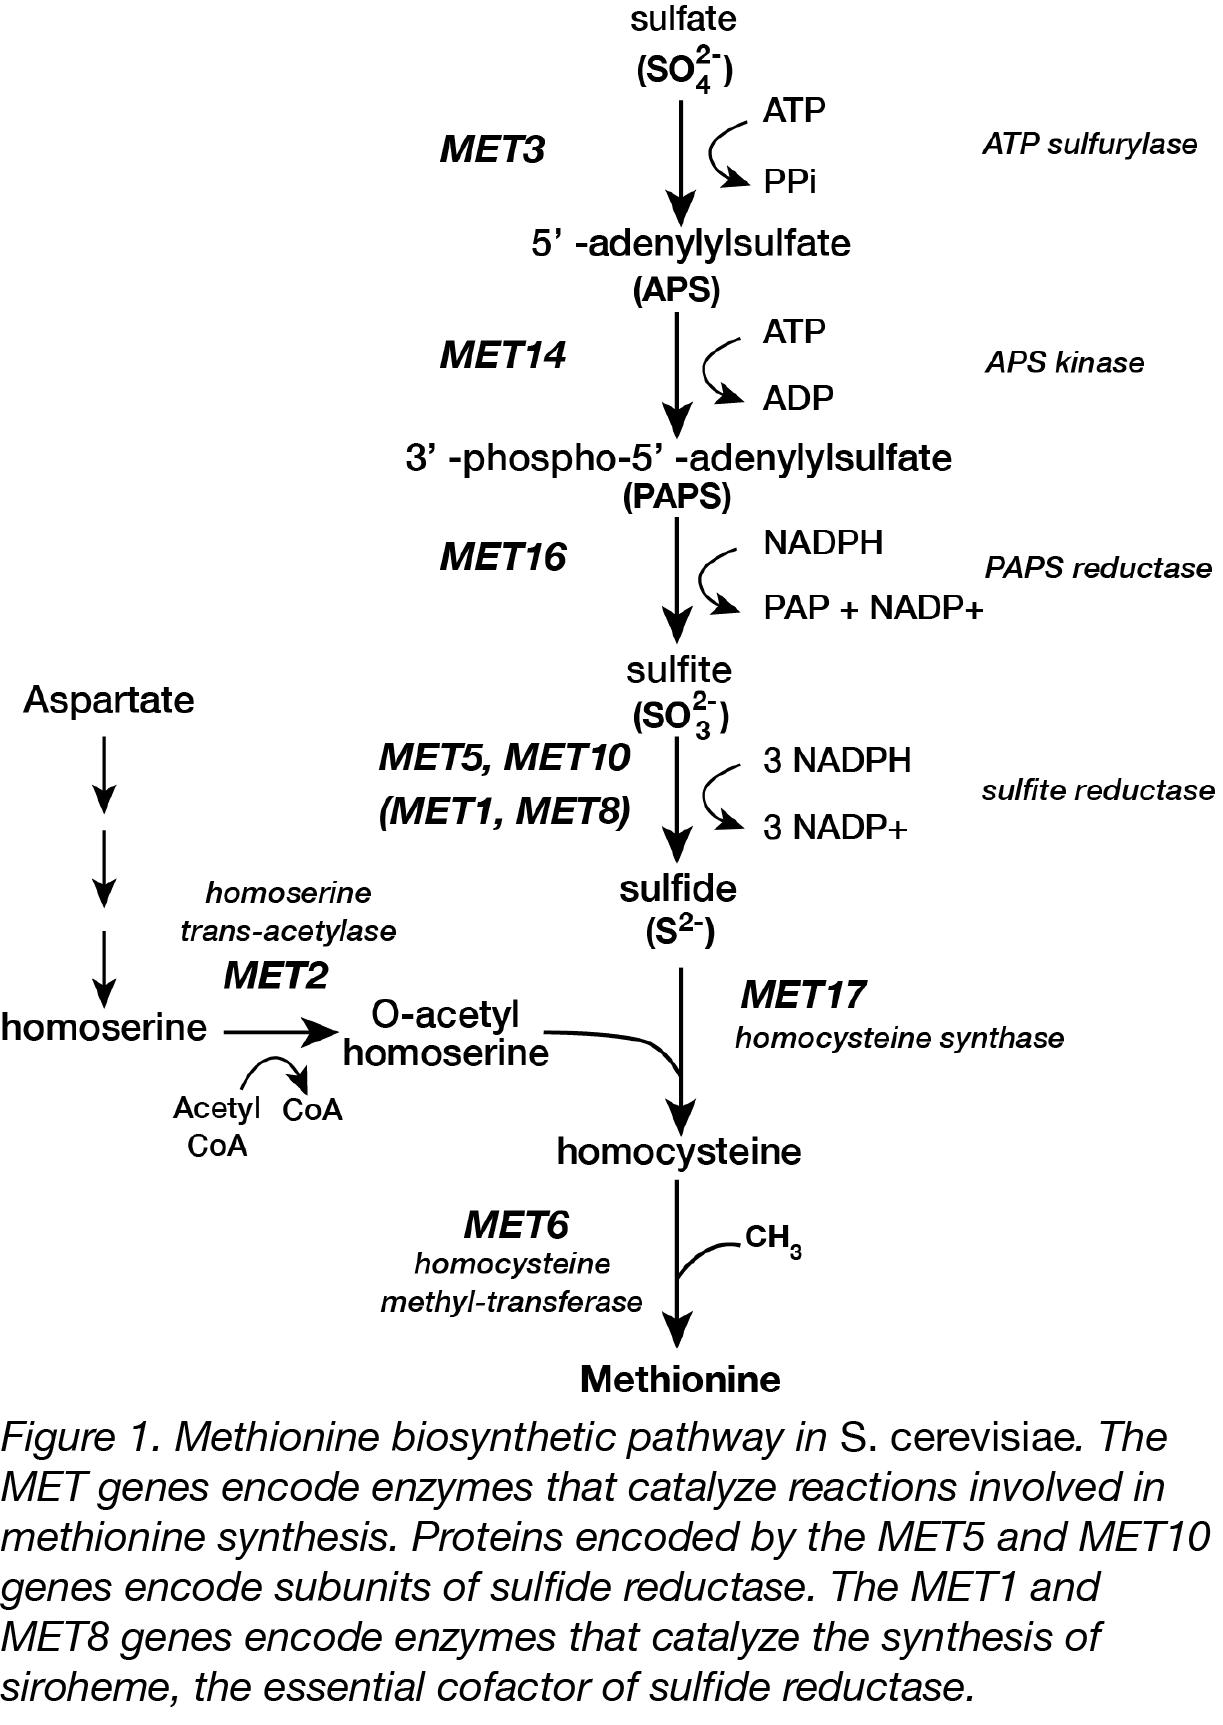 Methionine biosynthesis pathway in s. cerevisiae